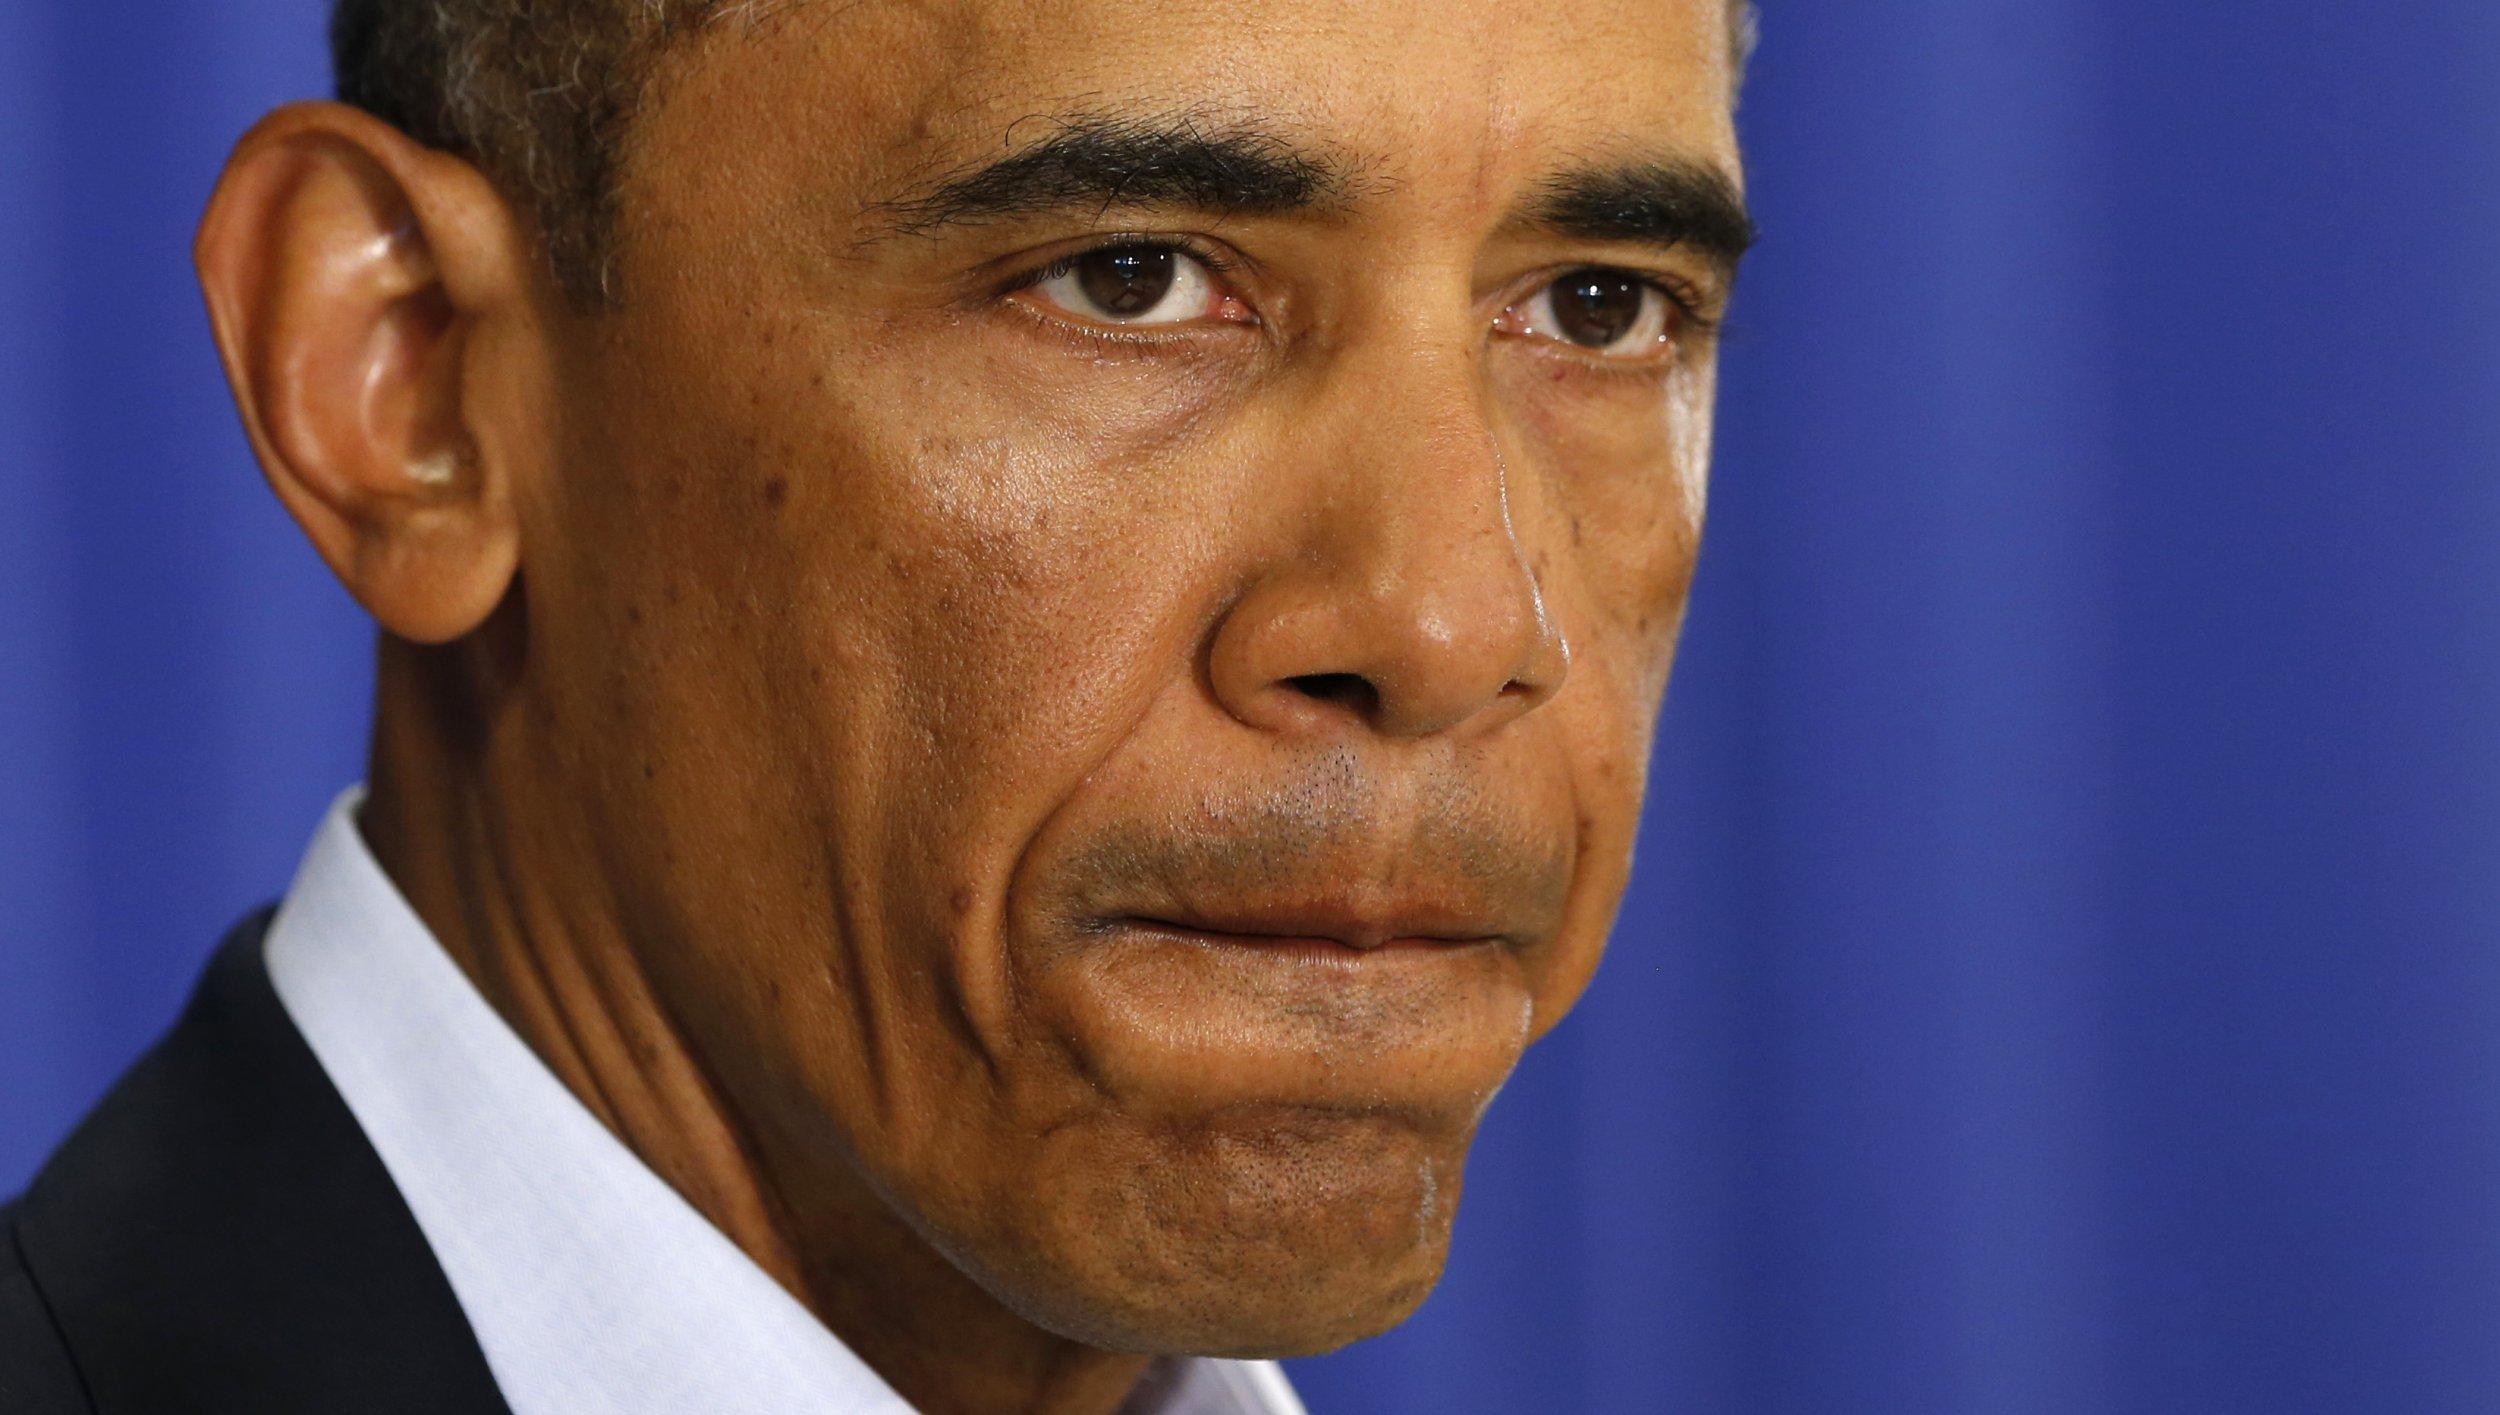 Obama on Islamic State